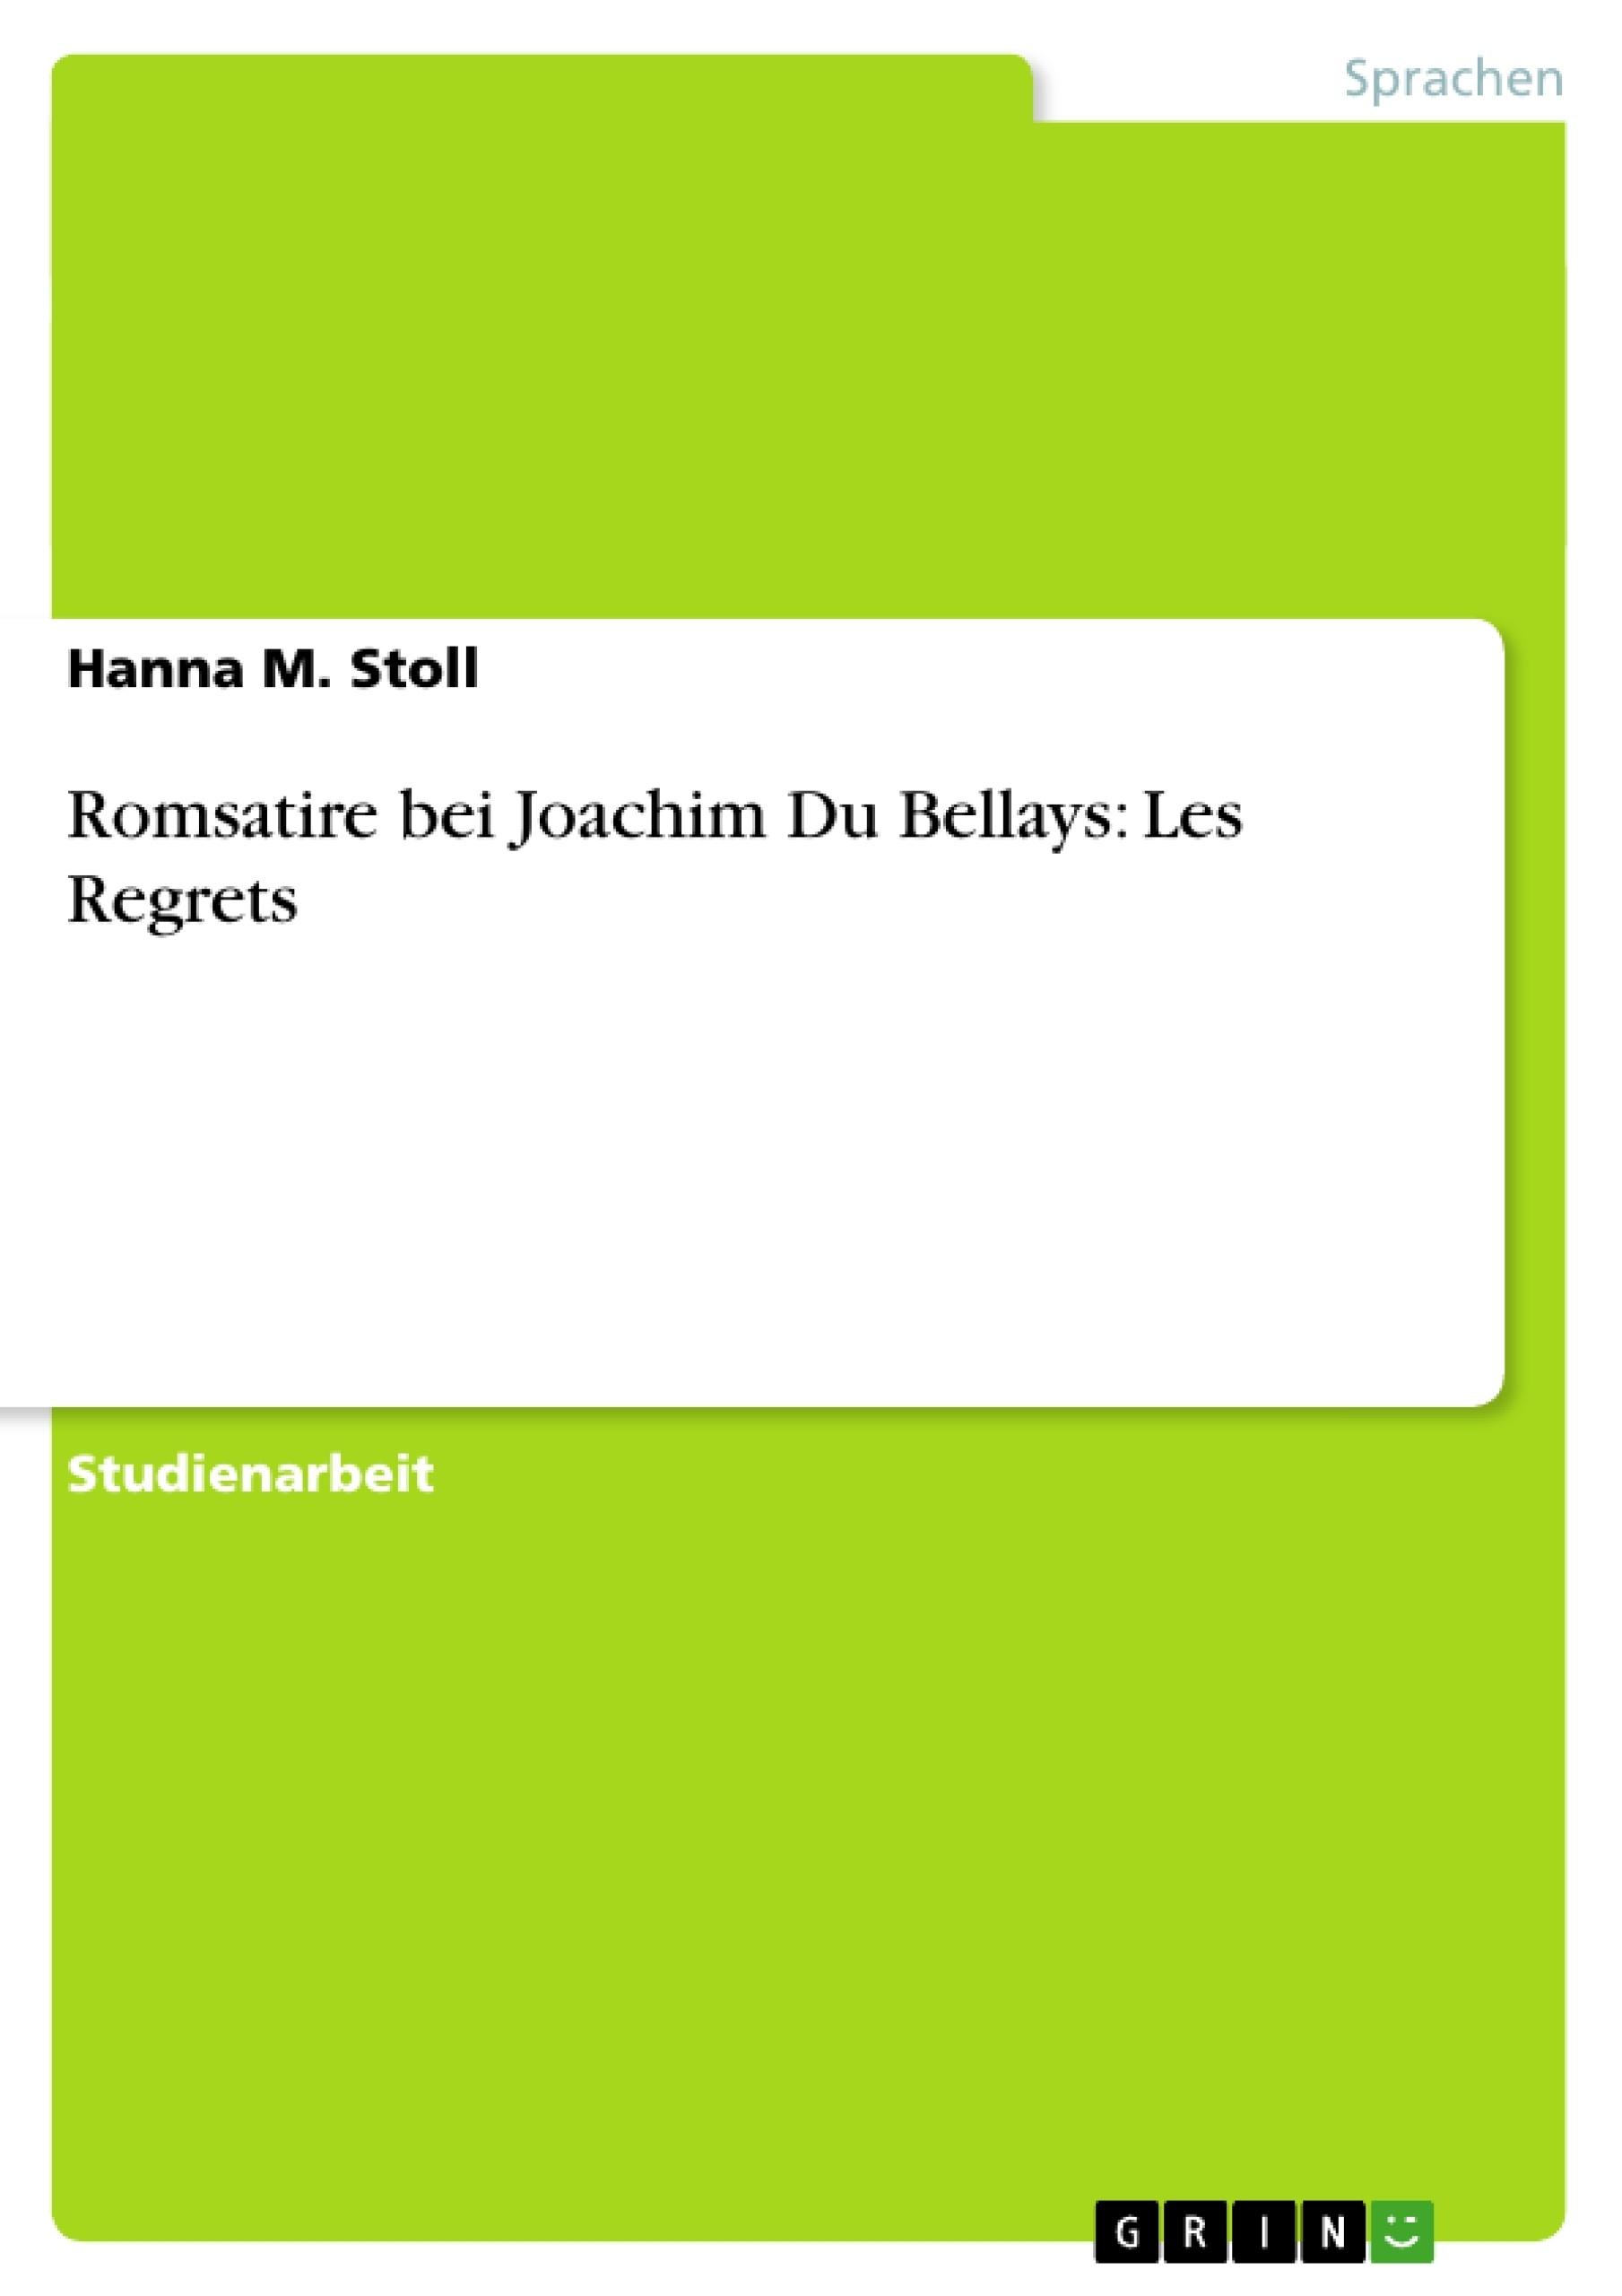 Titel: Romsatire bei Joachim Du Bellays: Les Regrets